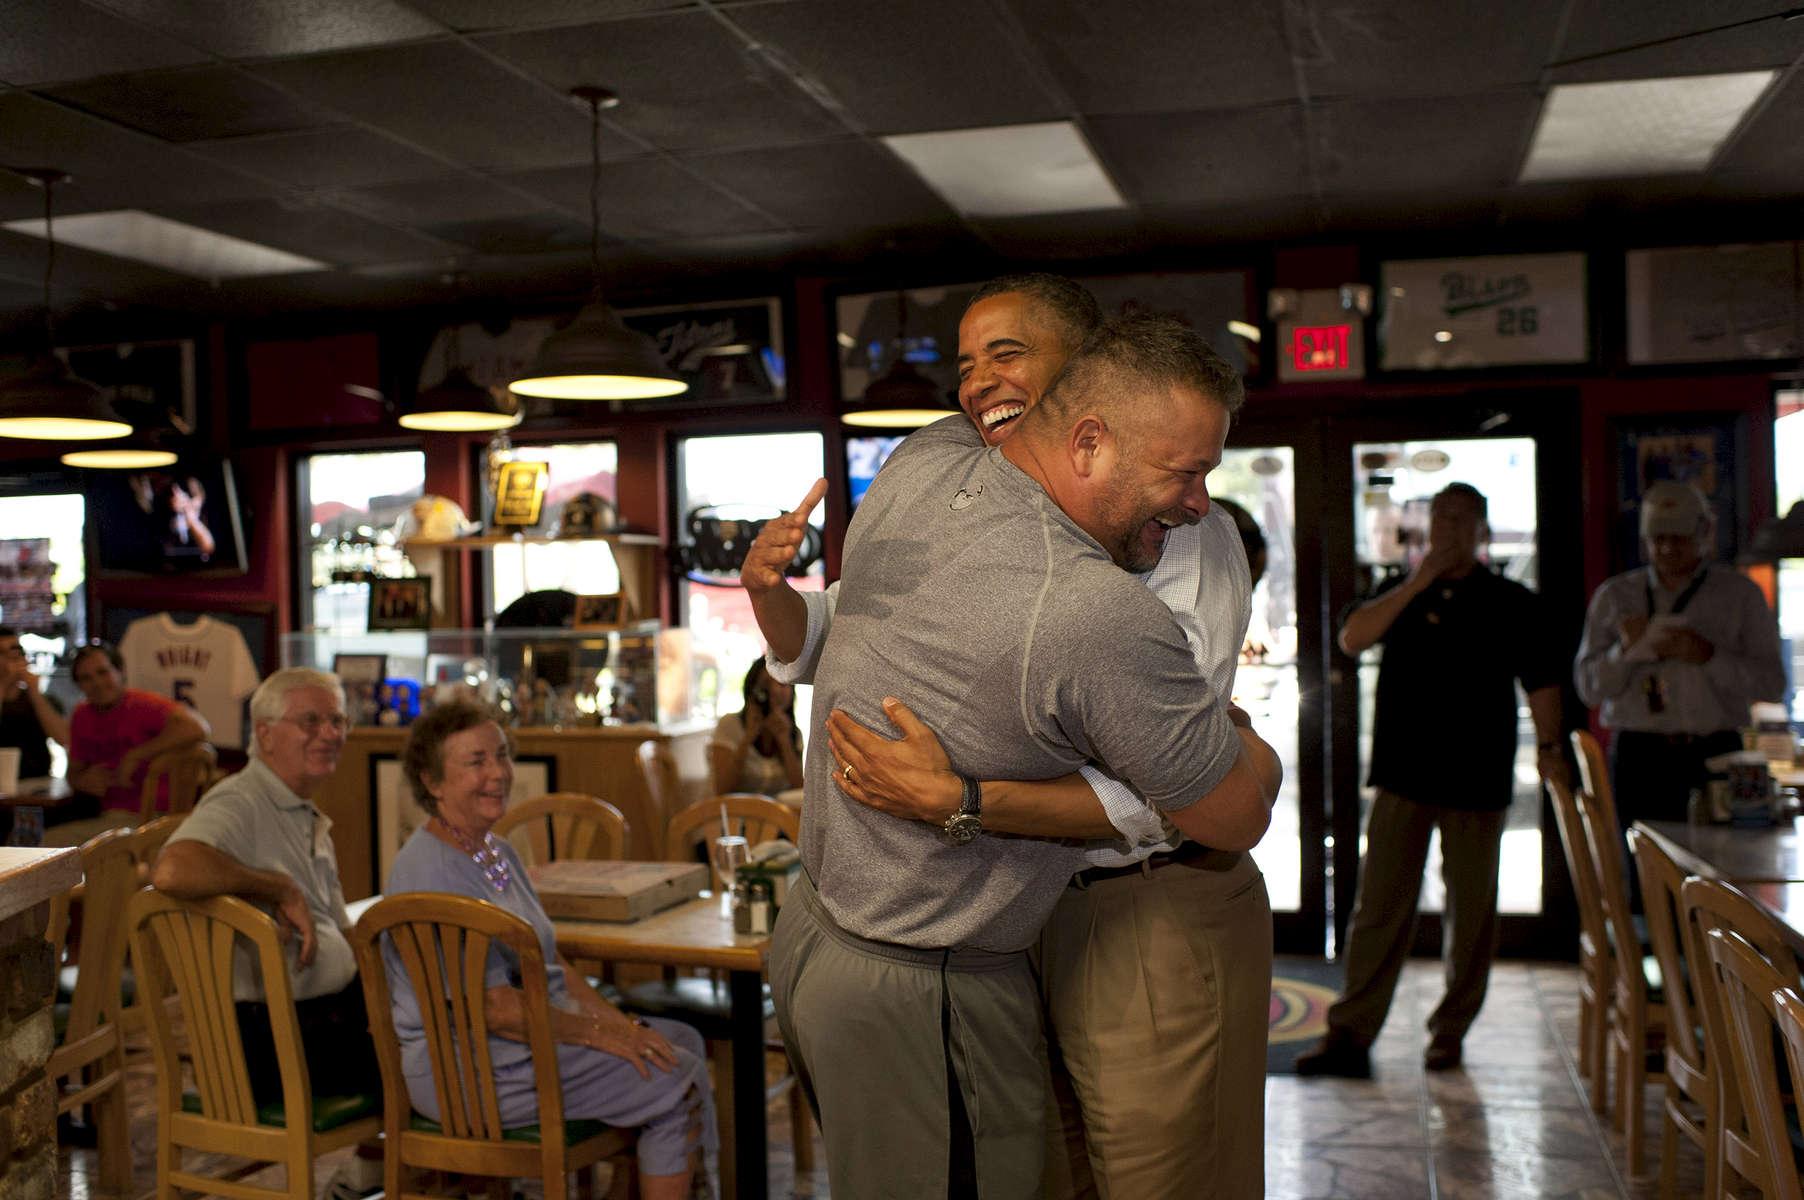 September 9, 2012 - Fort Pierce, FL: Big Apple Pizza owner Scott Van Duzer hugs President Barack Obama just before hoisting him up in an exuberant bear hug during the President's surprise visit to Van Duzer's shop in Ft. Pierce, Florida. (Scout Tufankjian for Obama for America/Polaris)